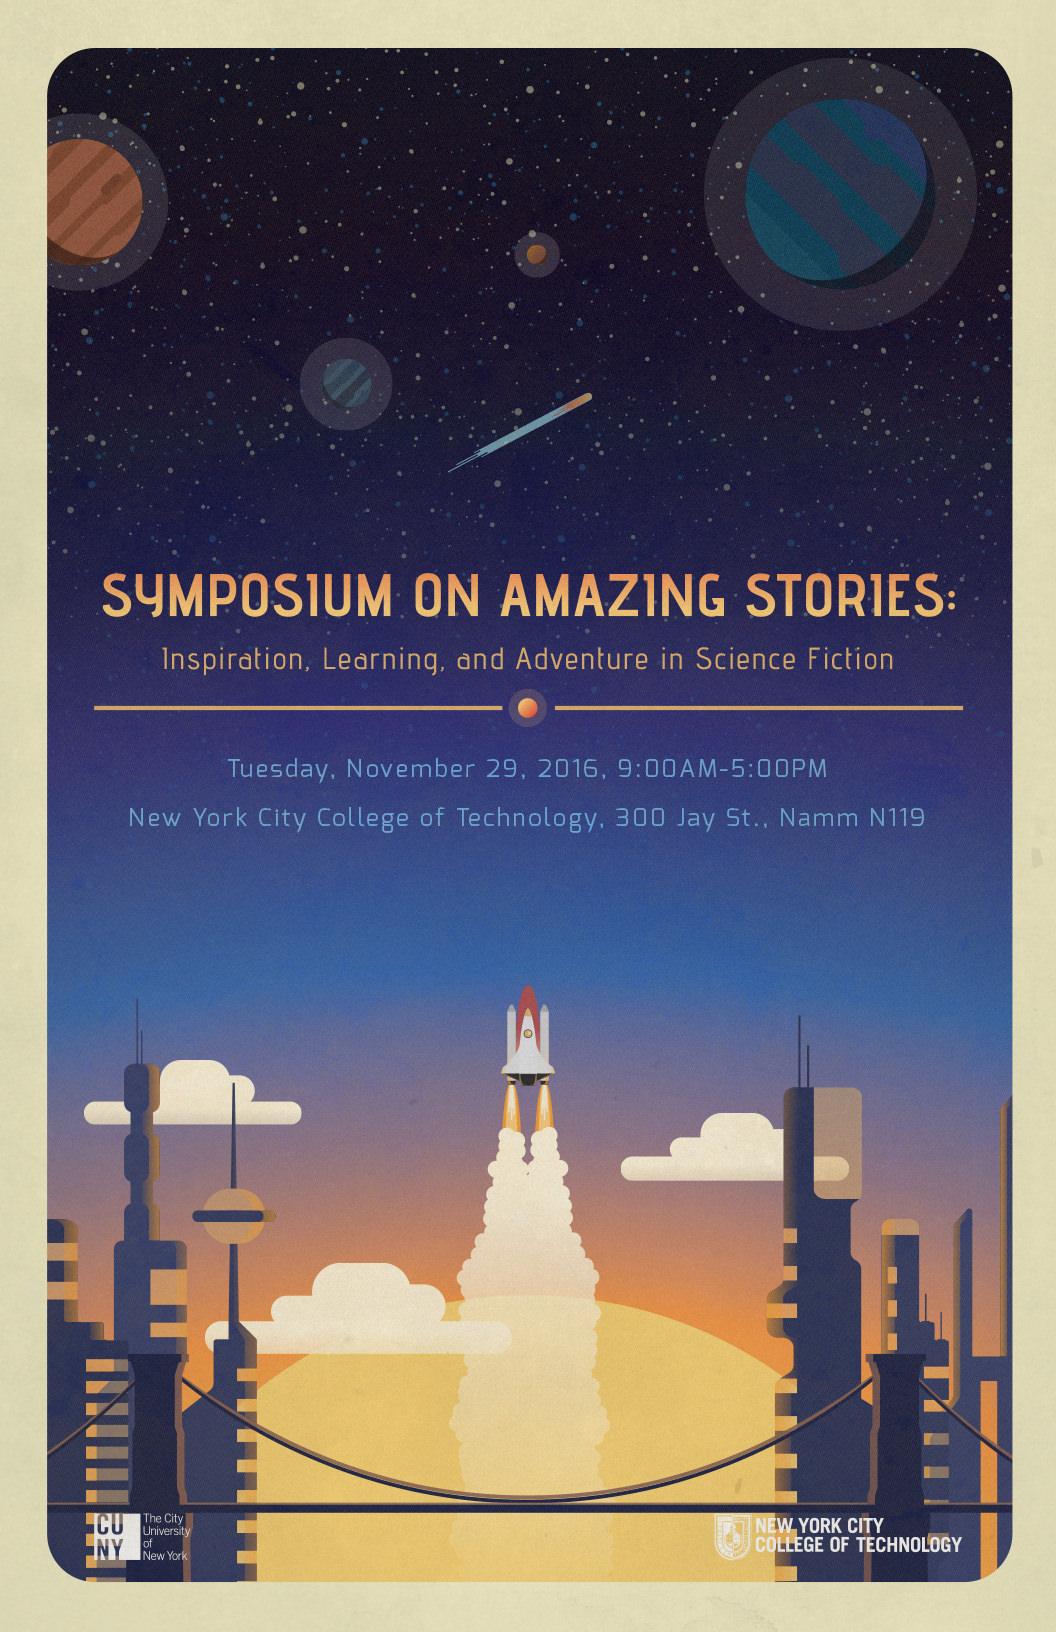 Symposium on Amazing Stories